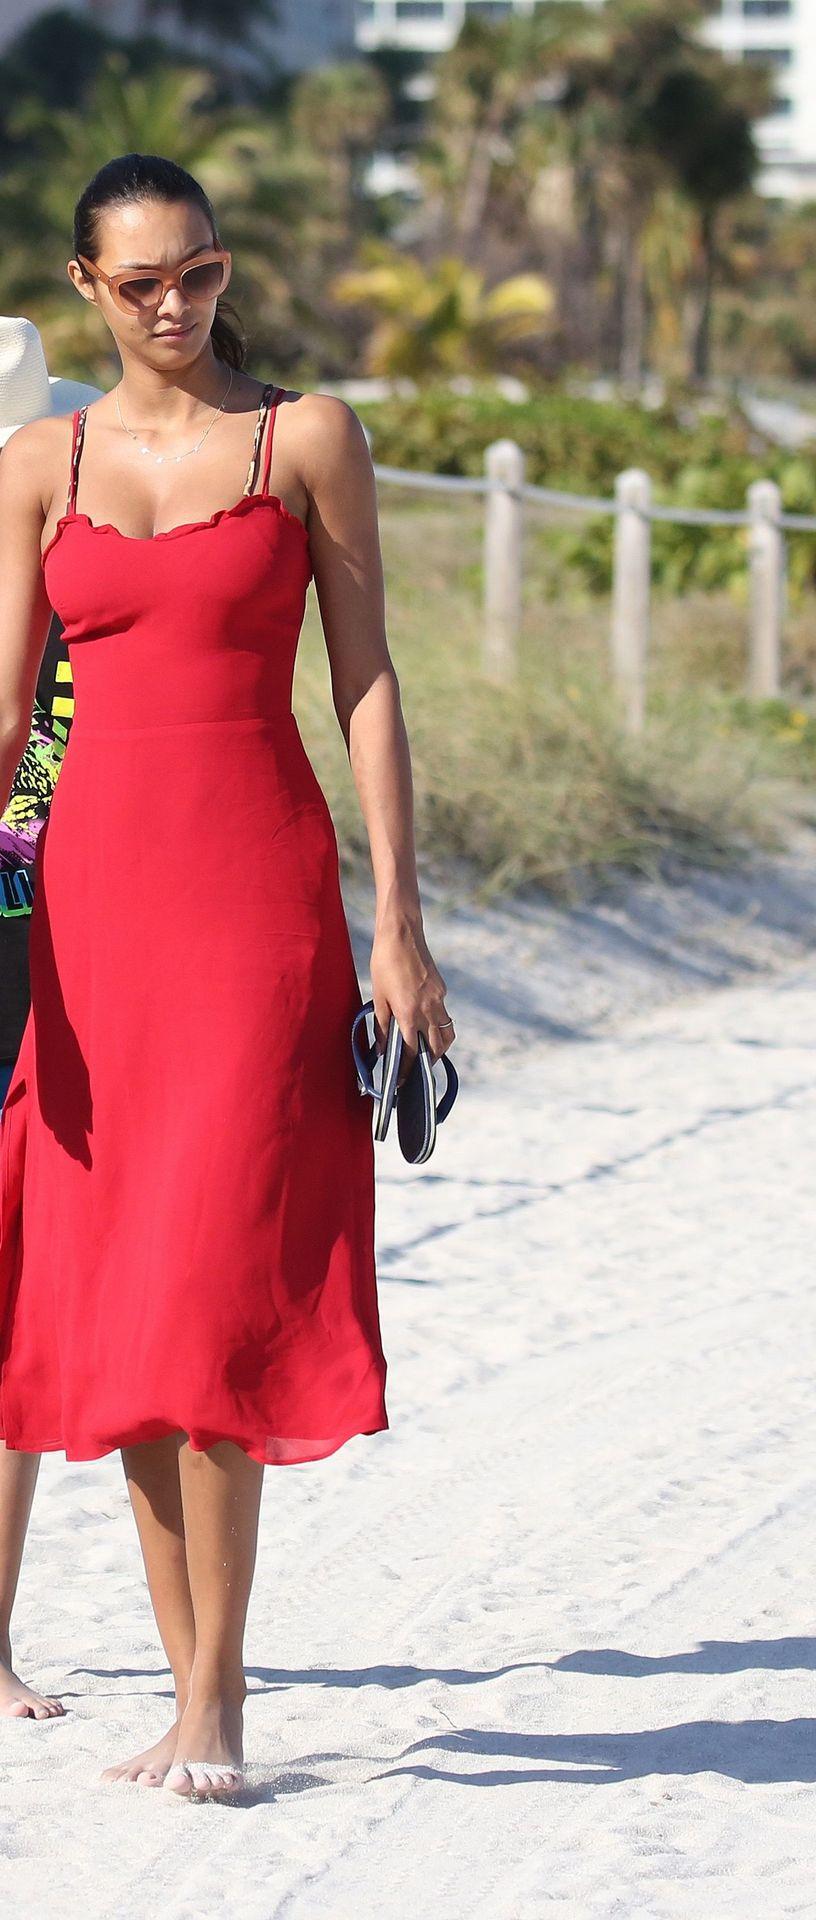 Candice Swanepoel & Lais Ribeiro Both Wear Tiny Leopard Print Bikinis on the Beach in Miami (69 Photos)